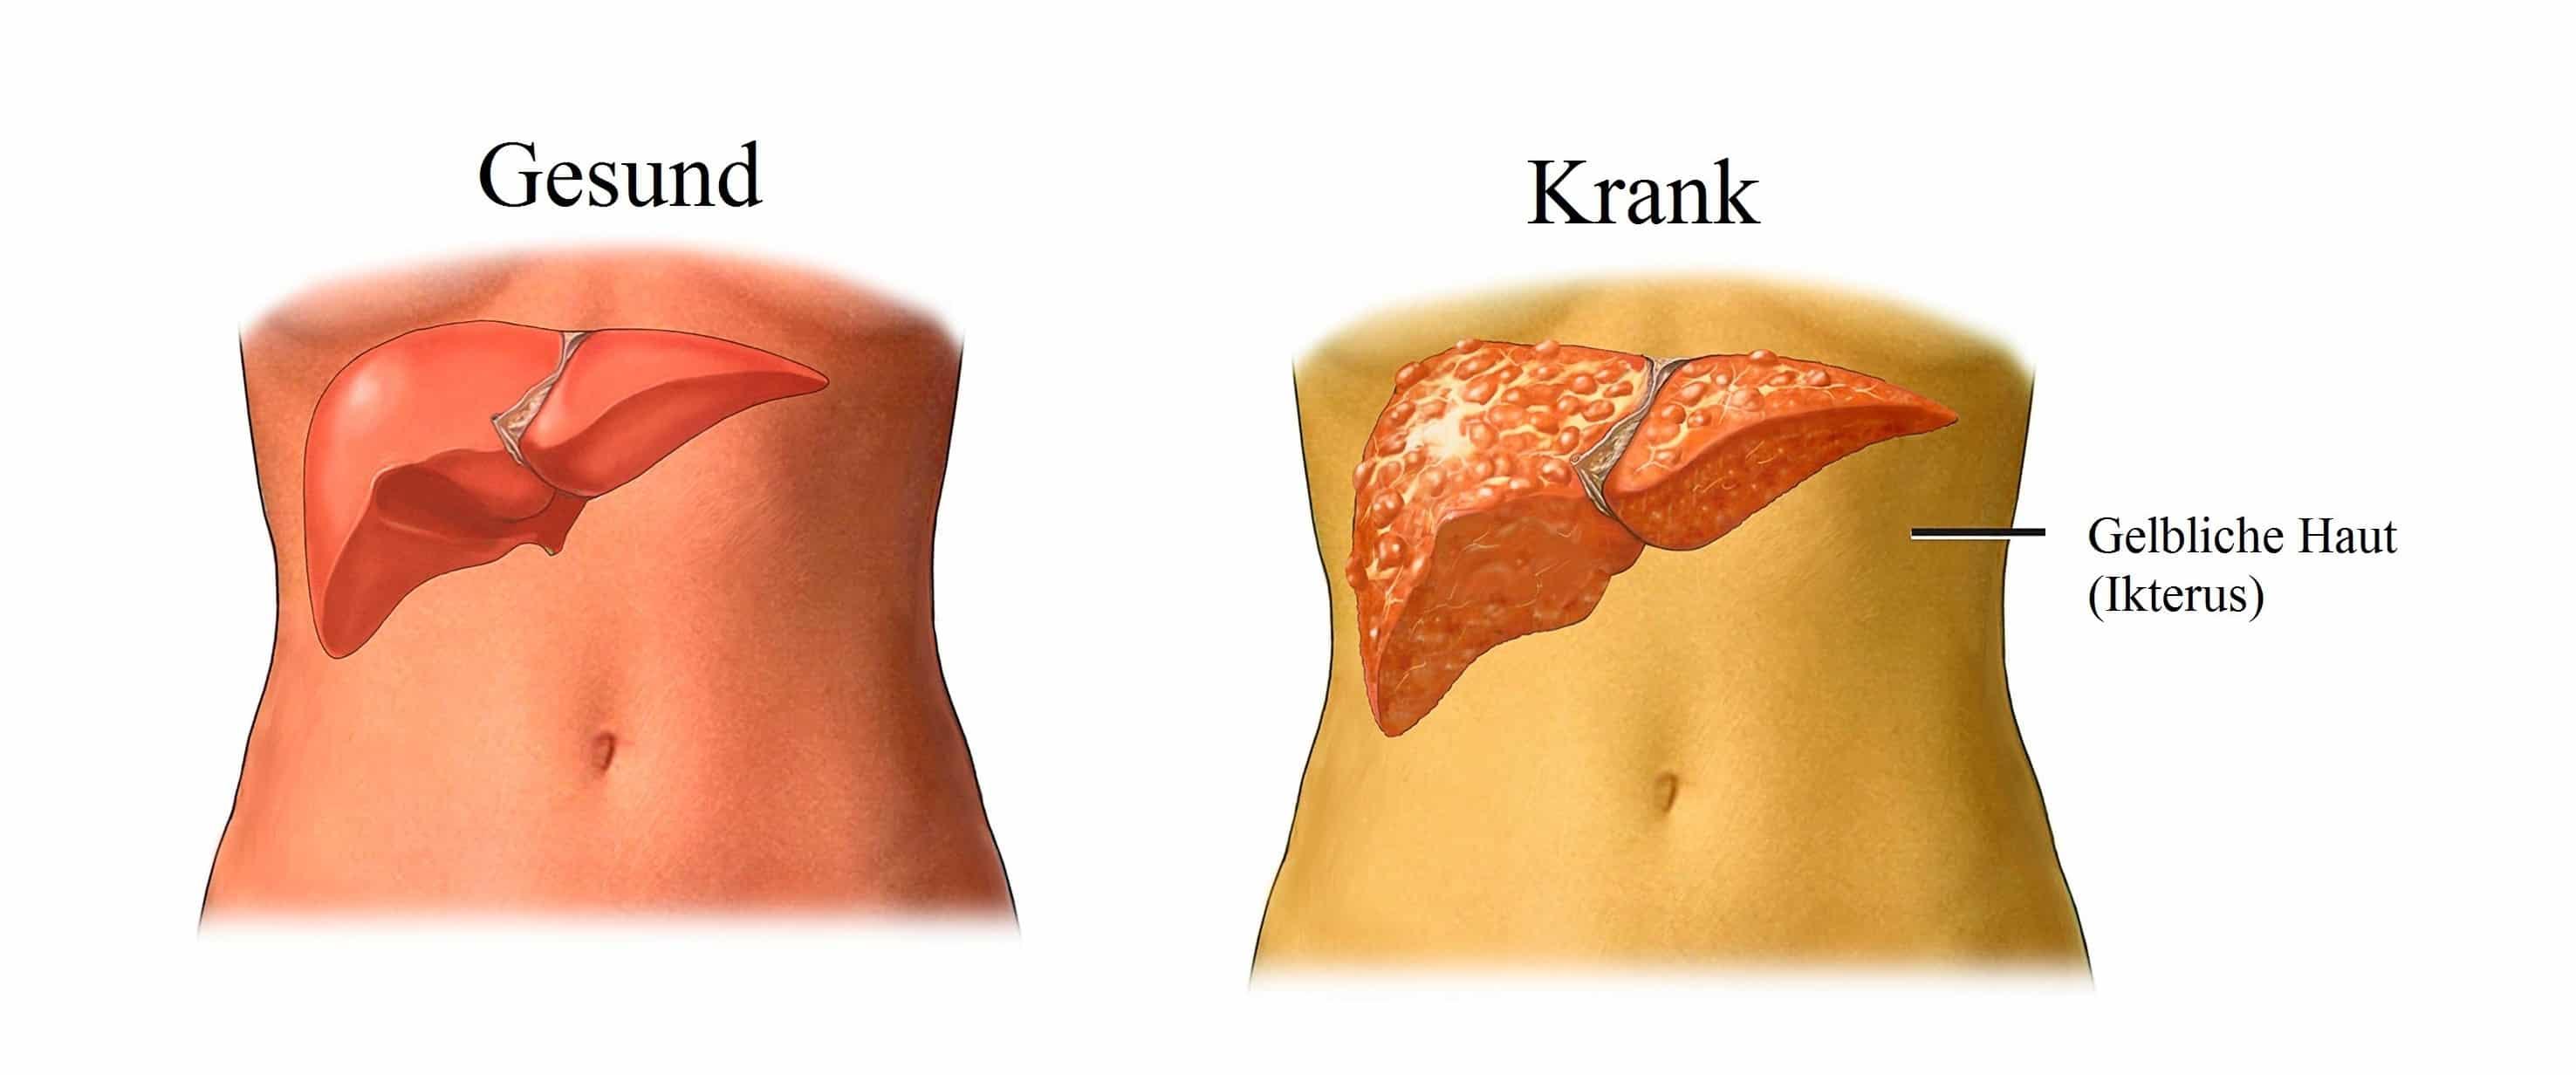 Lebertumor, Symptome und Ursachen, Stadium, Metastasen